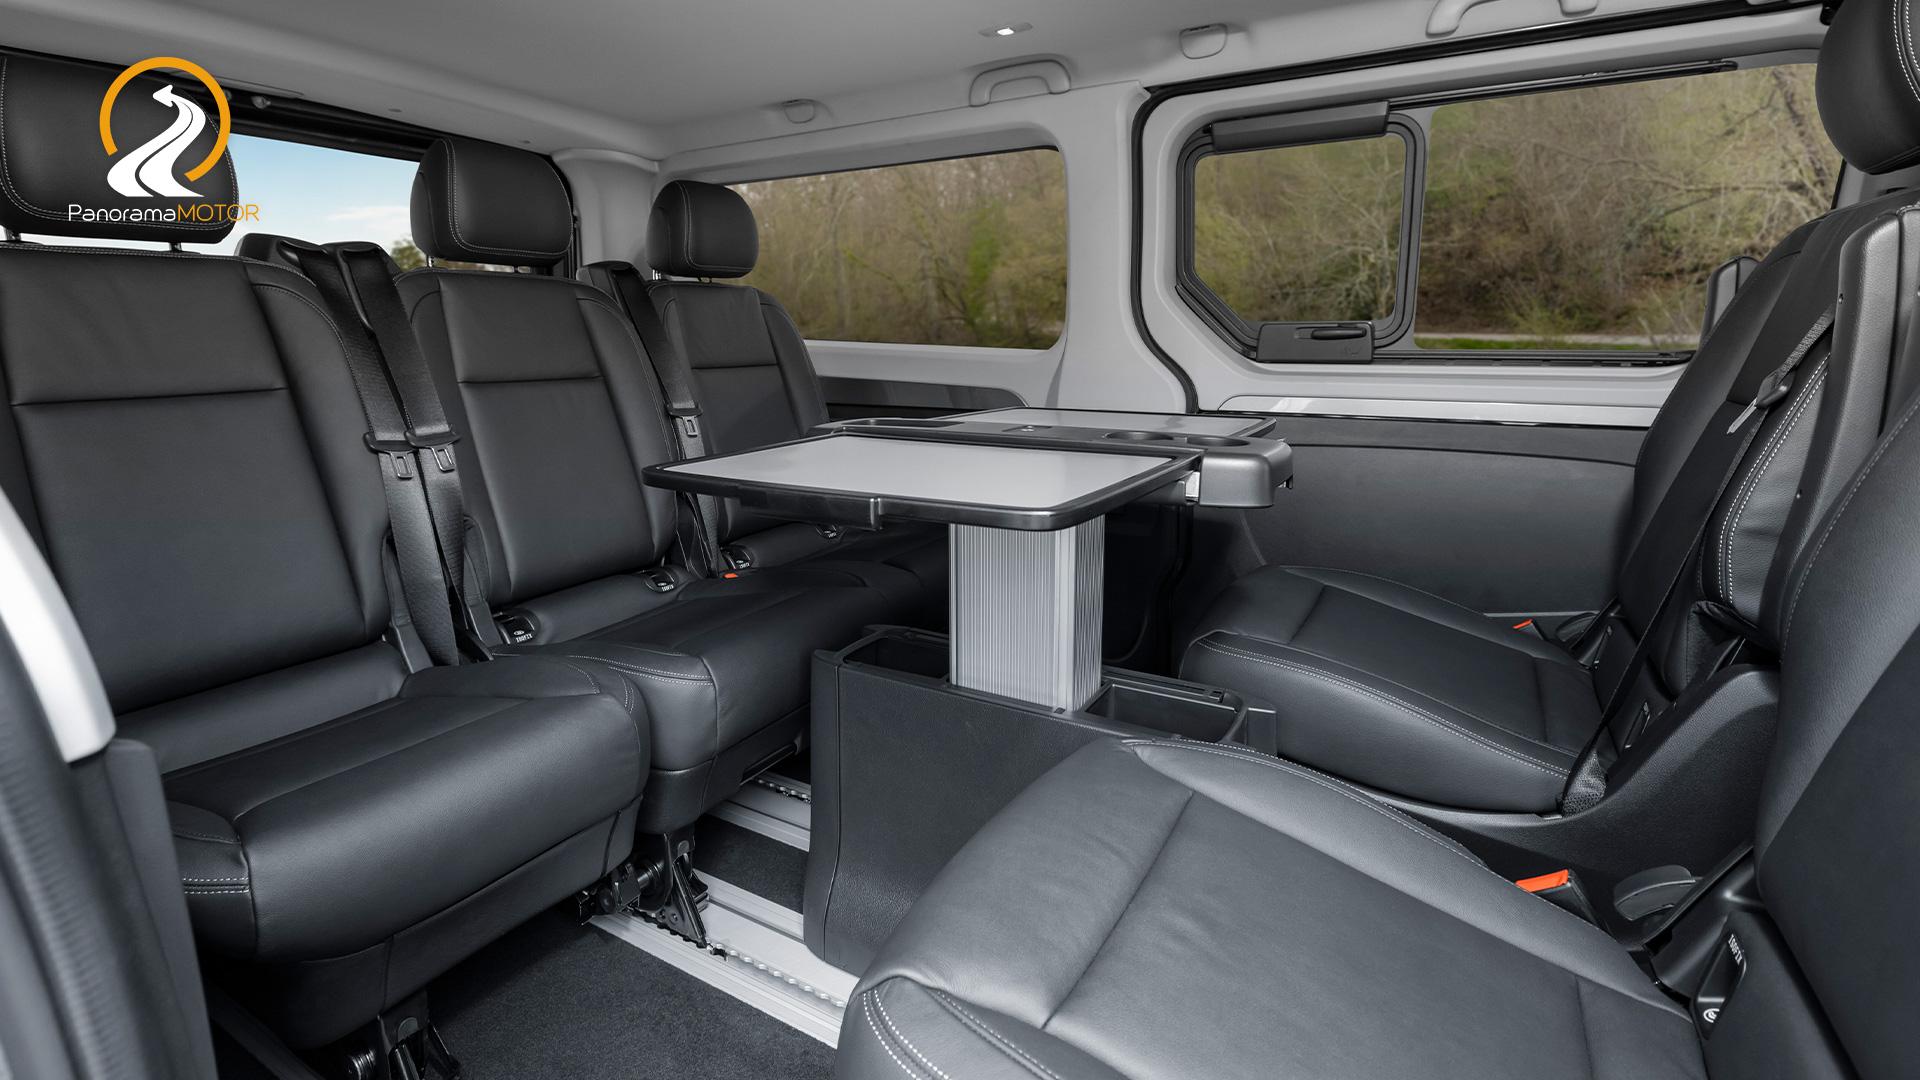 Renault Trafic Spaceclass Business Premium 2021